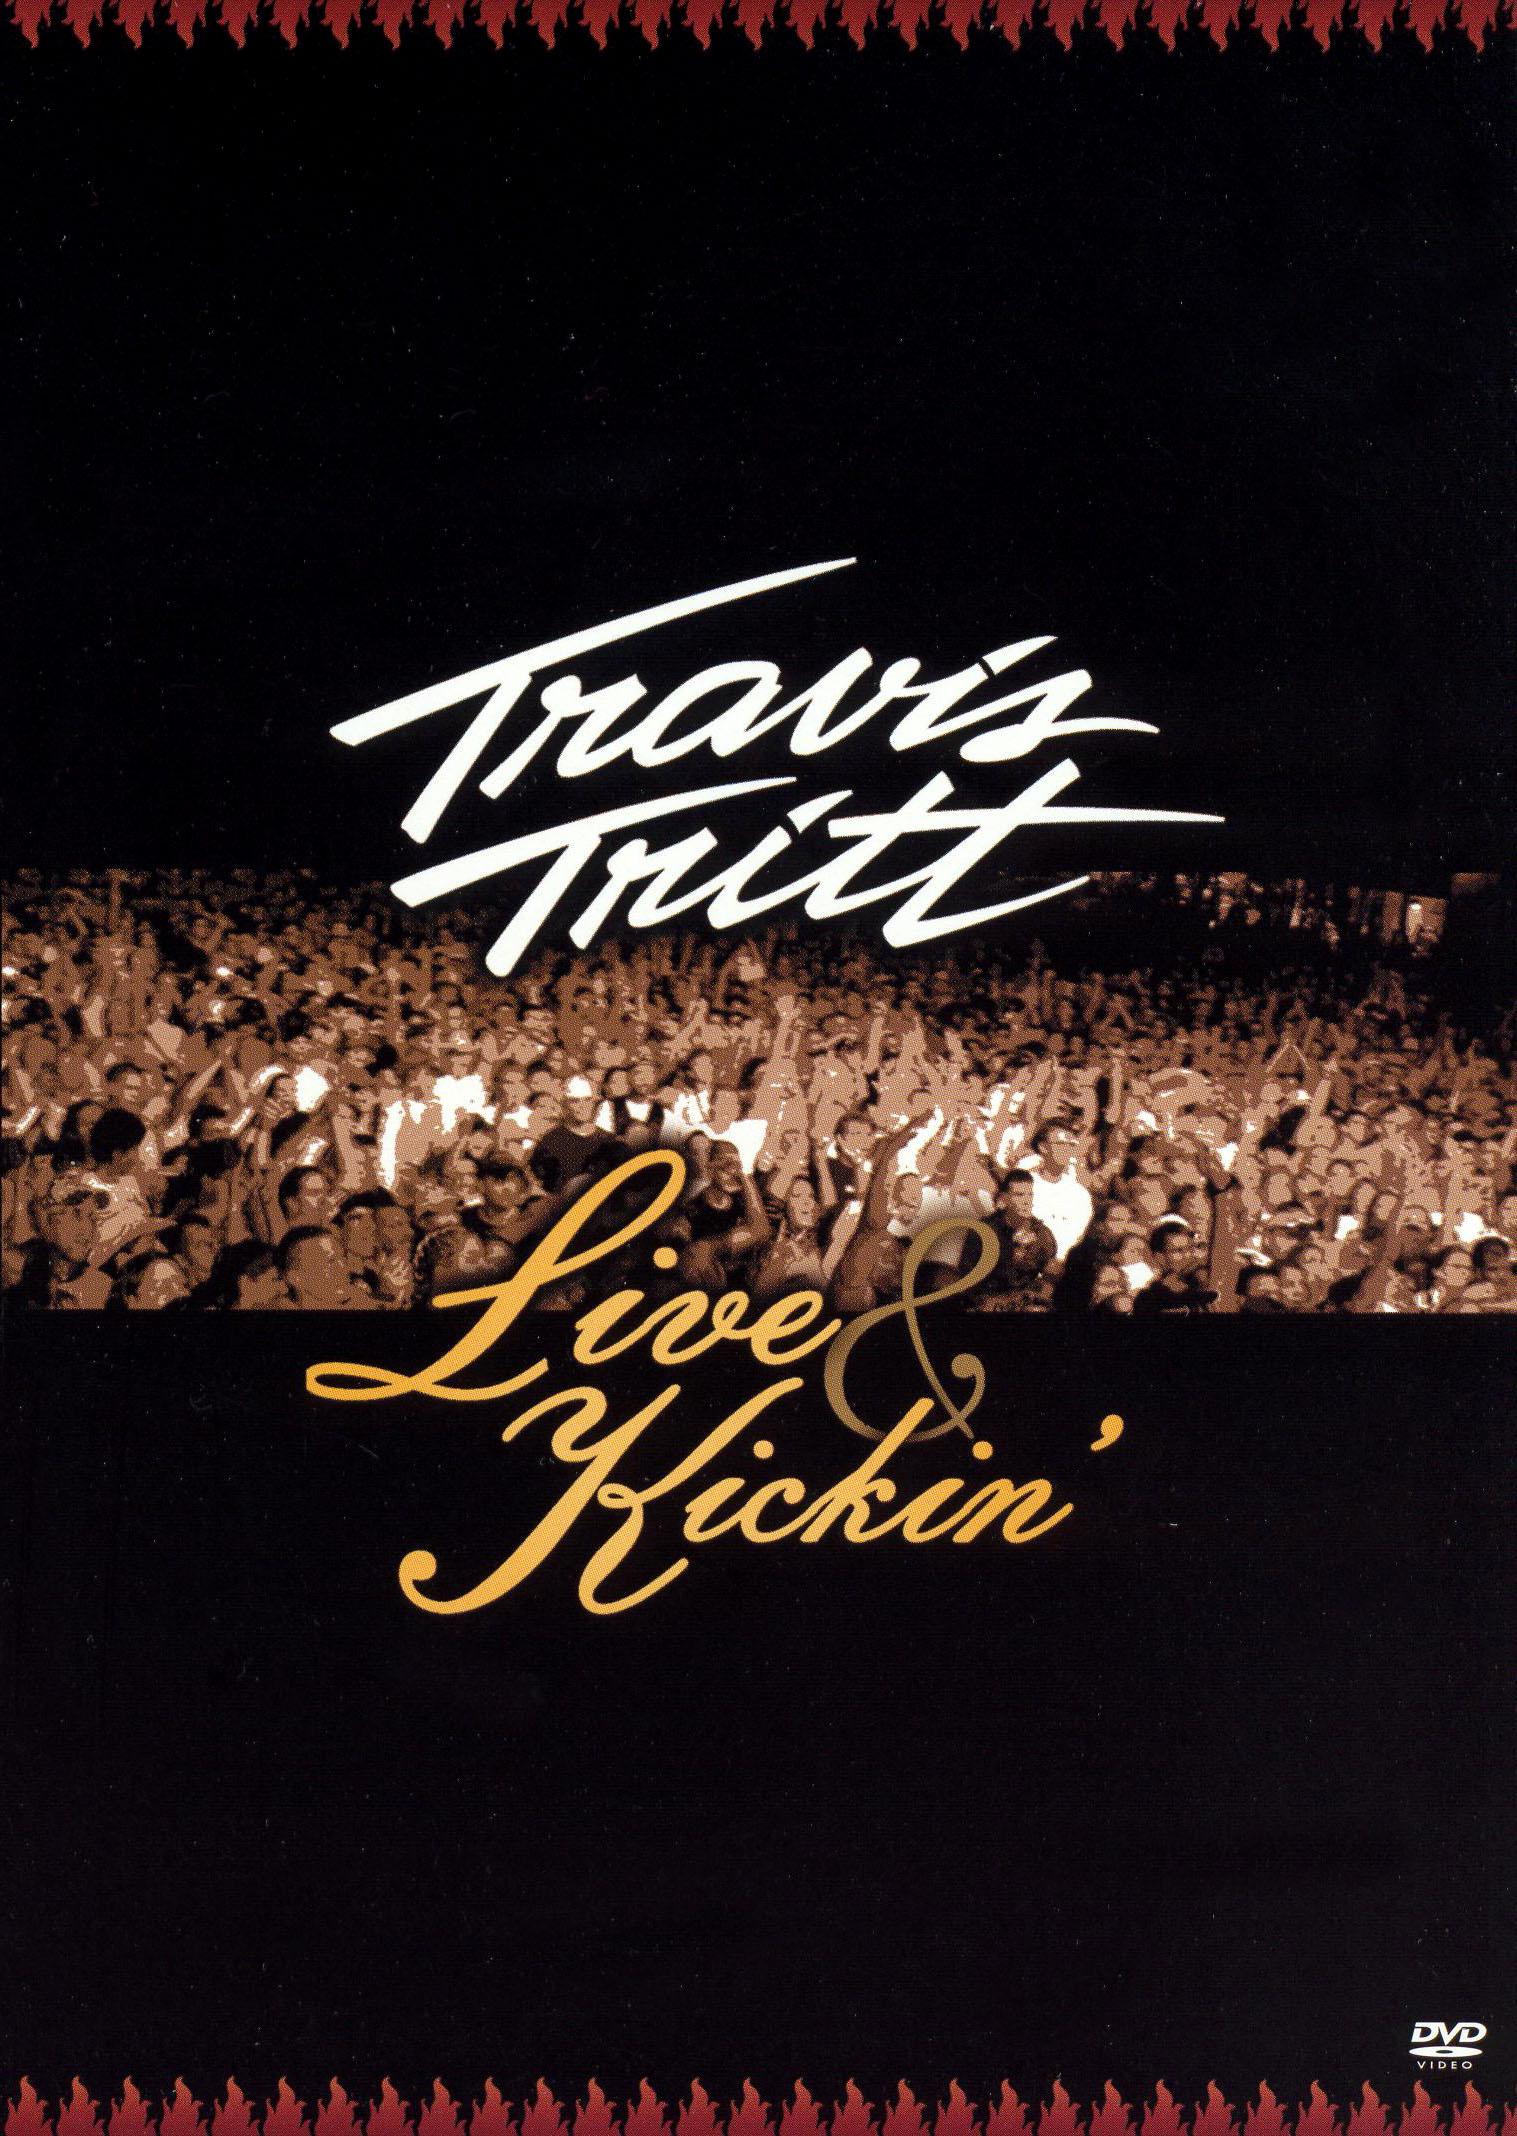 Travis Tritt: Live and Kickin'